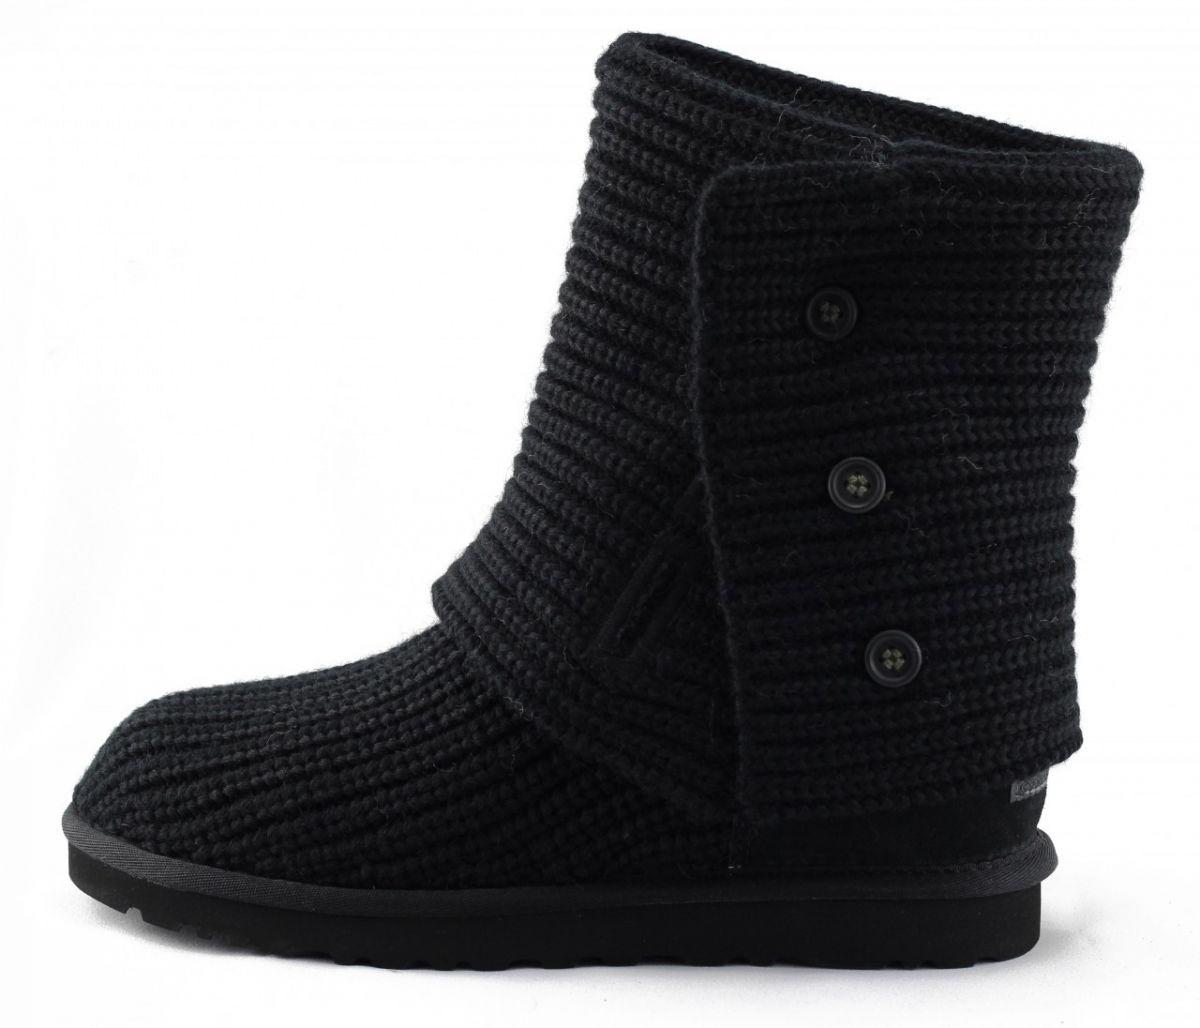 4710b1a1286 UGG Australia for Women: Cardy Black Boots BLACK